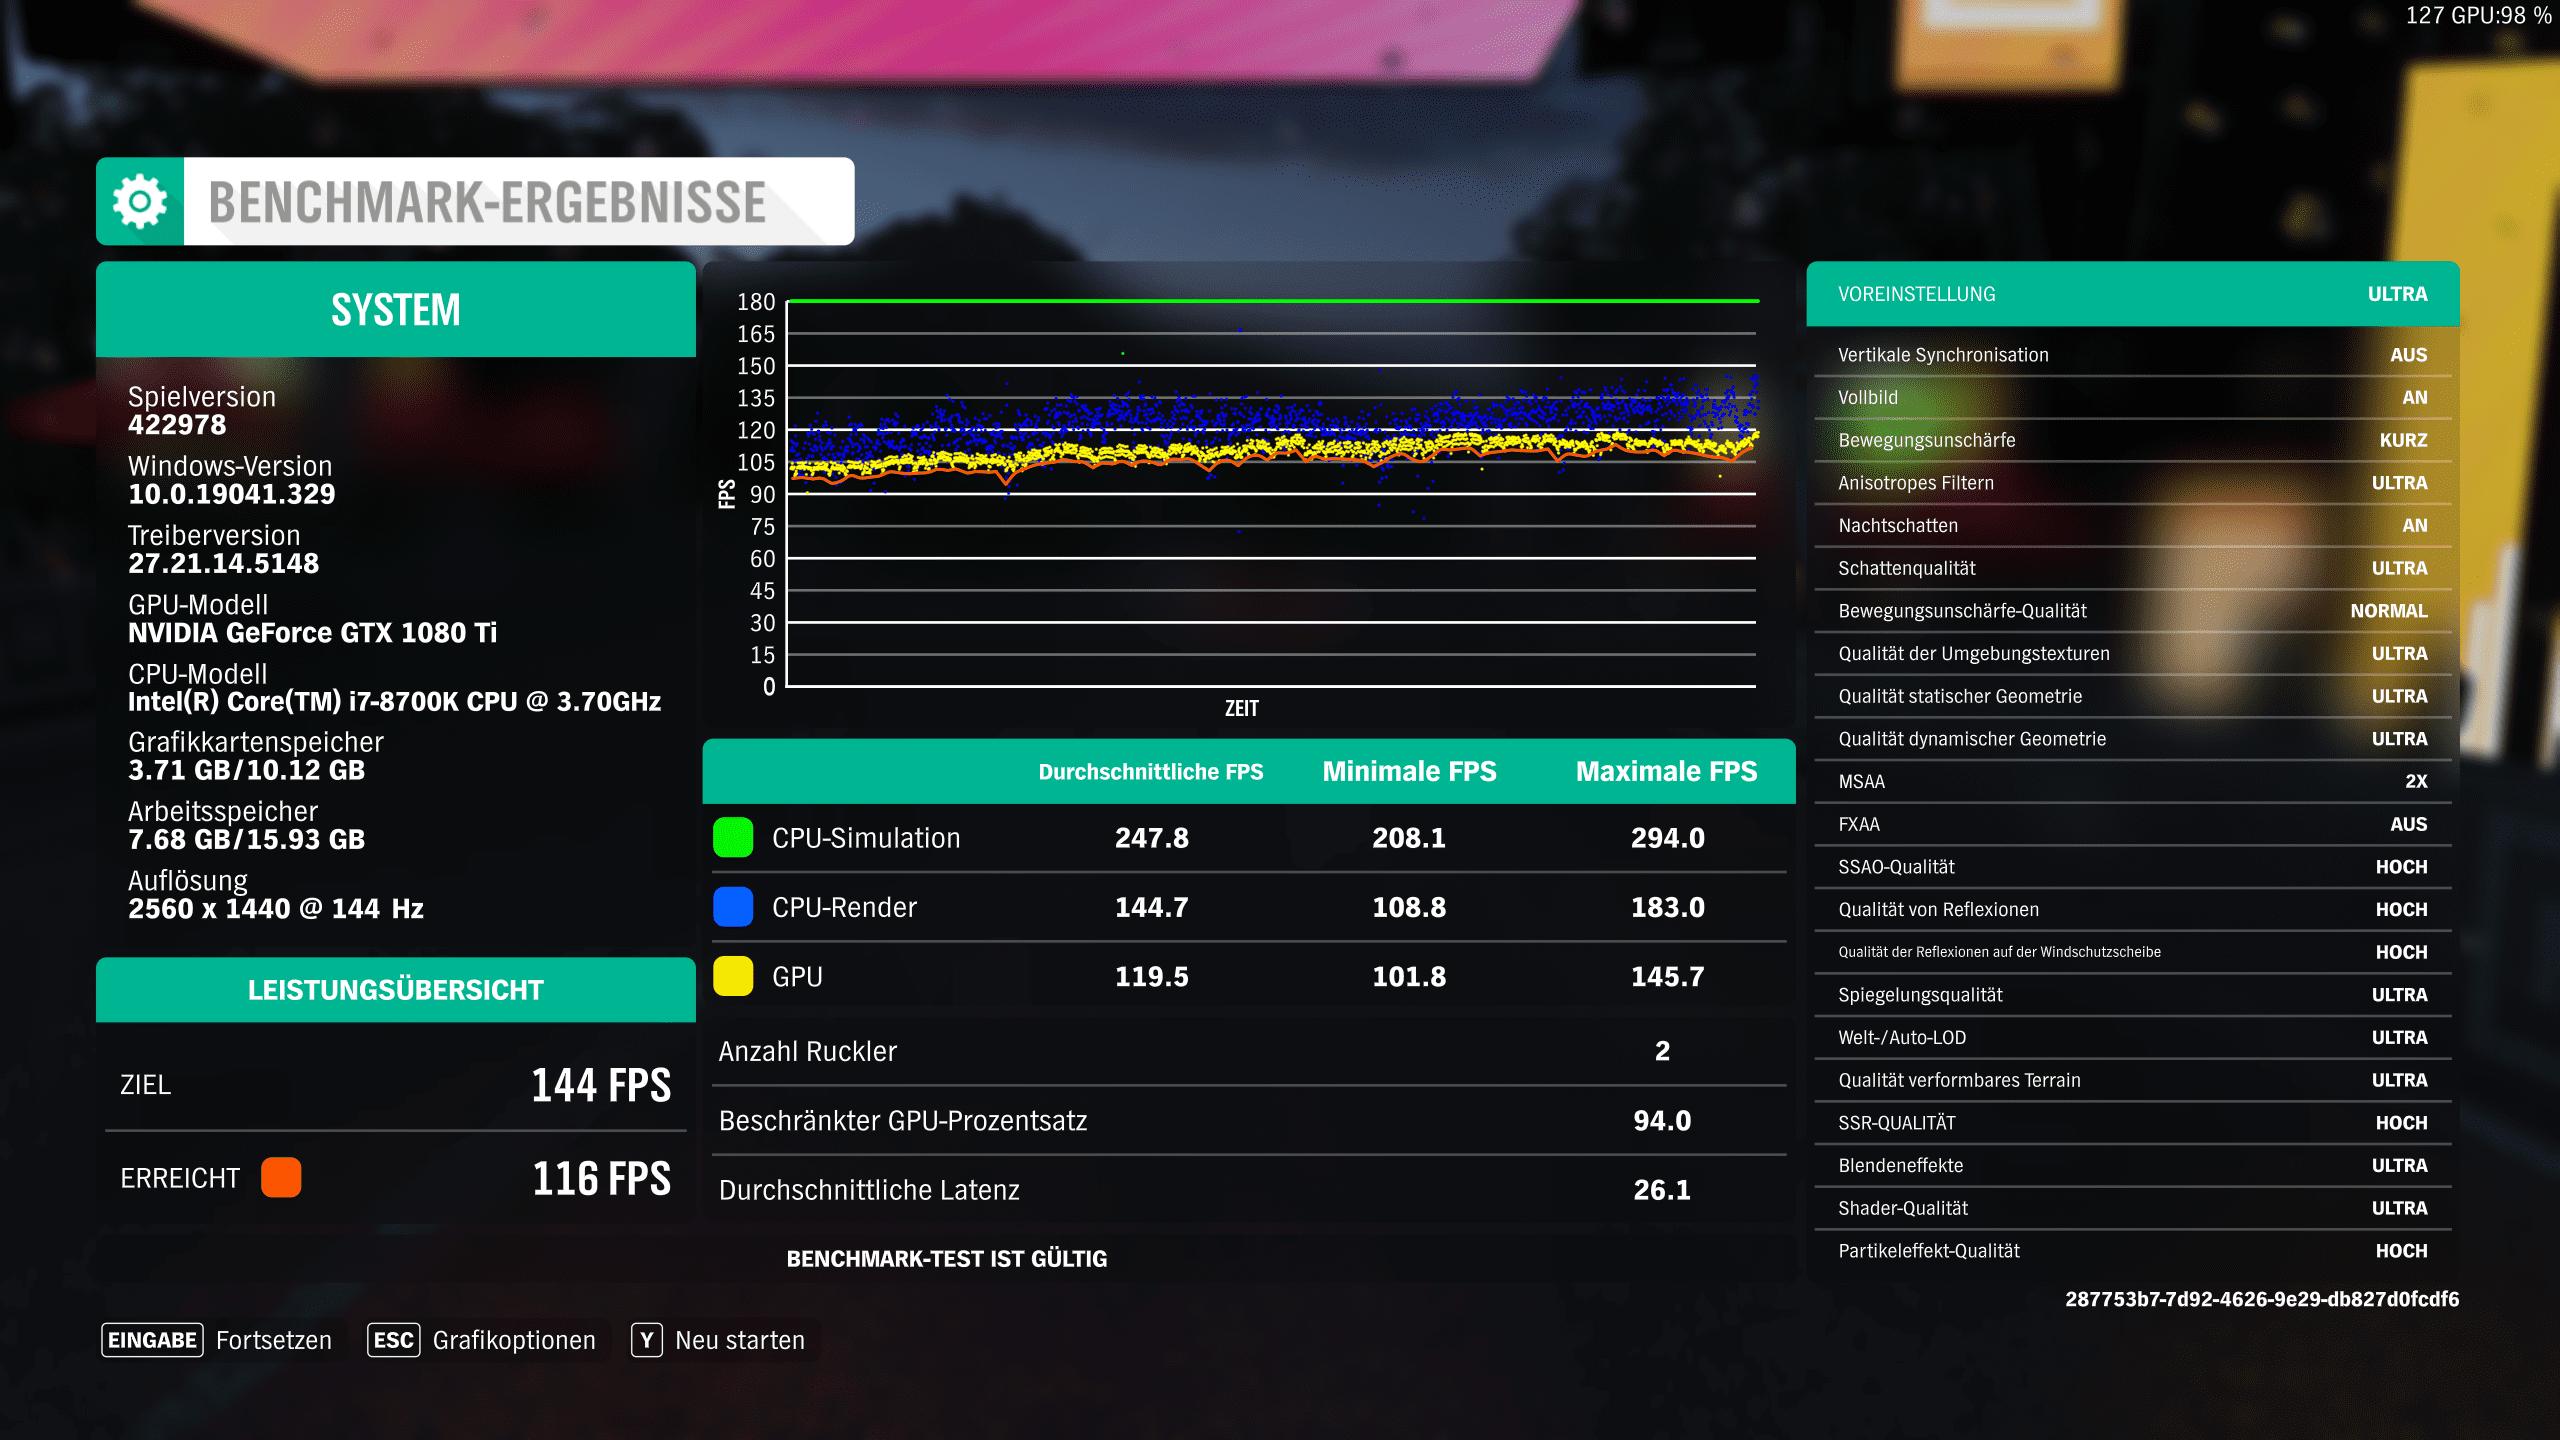 451.48 GPU Planung Aus.png